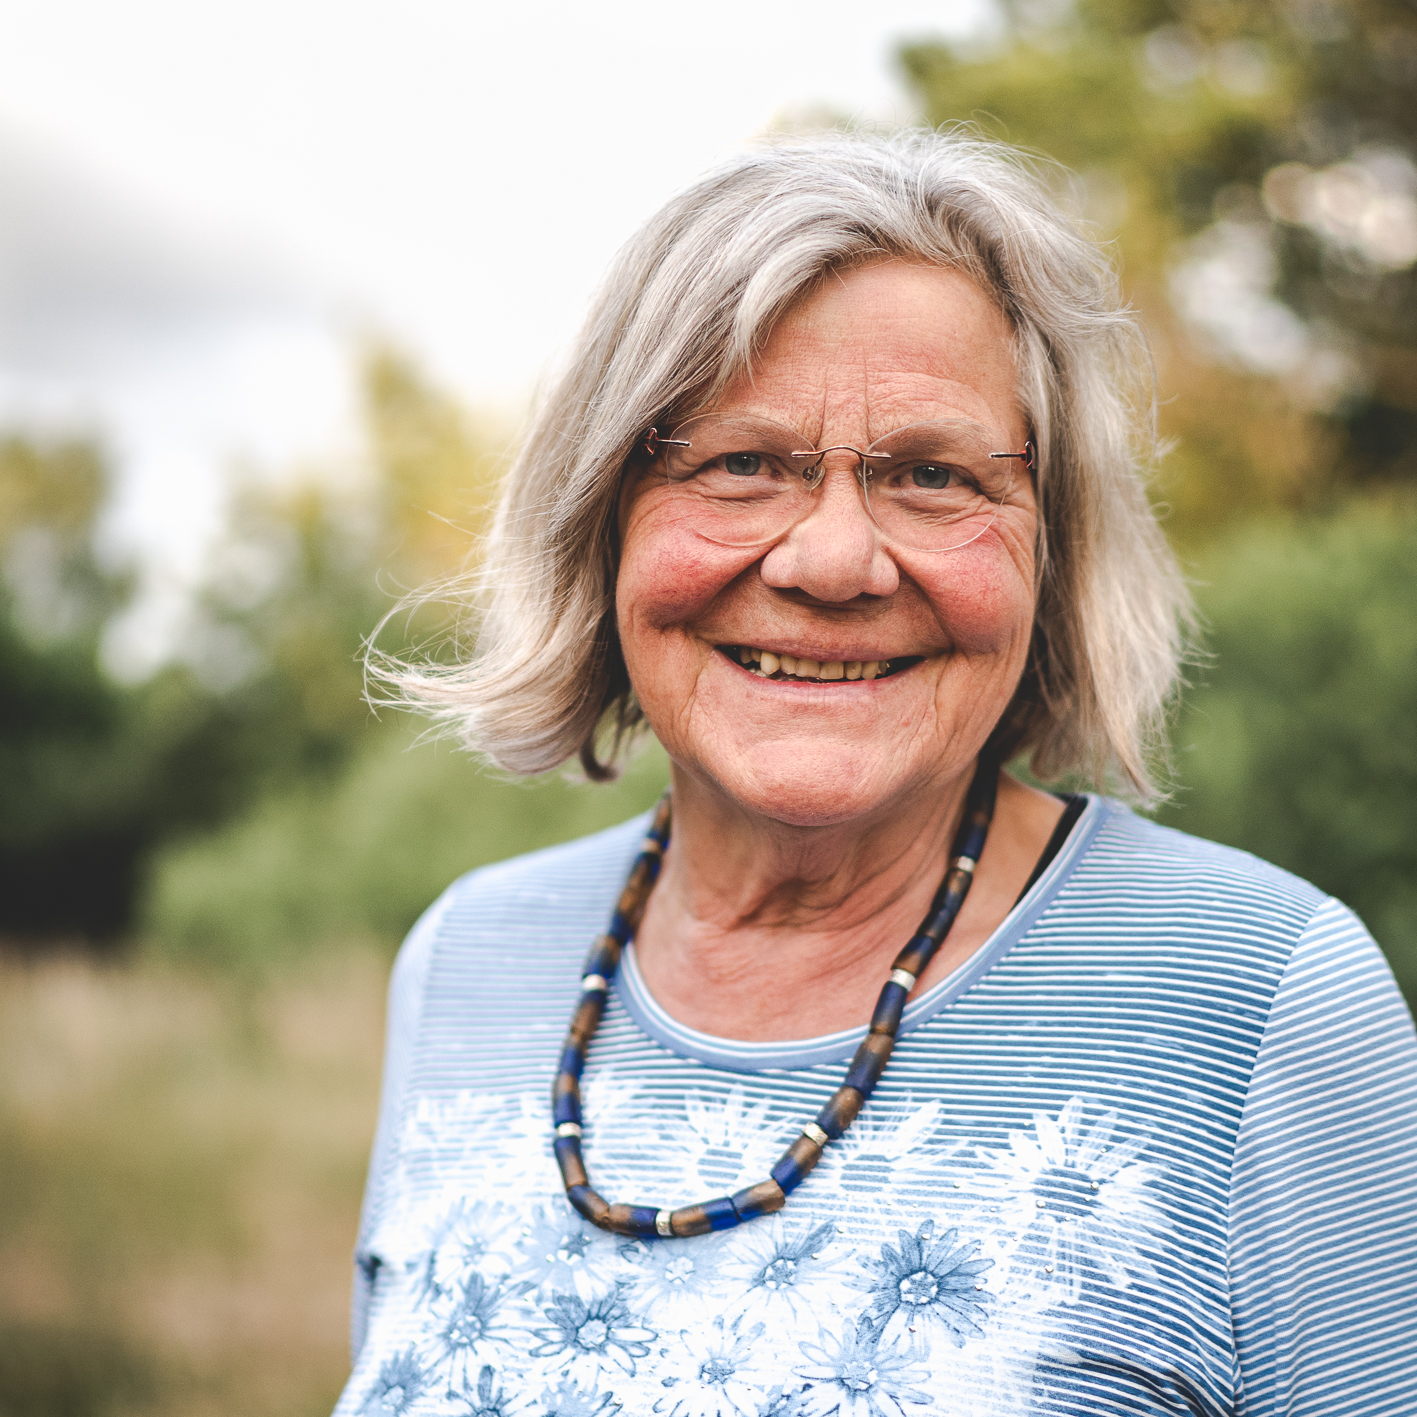 Christiane Wilkening